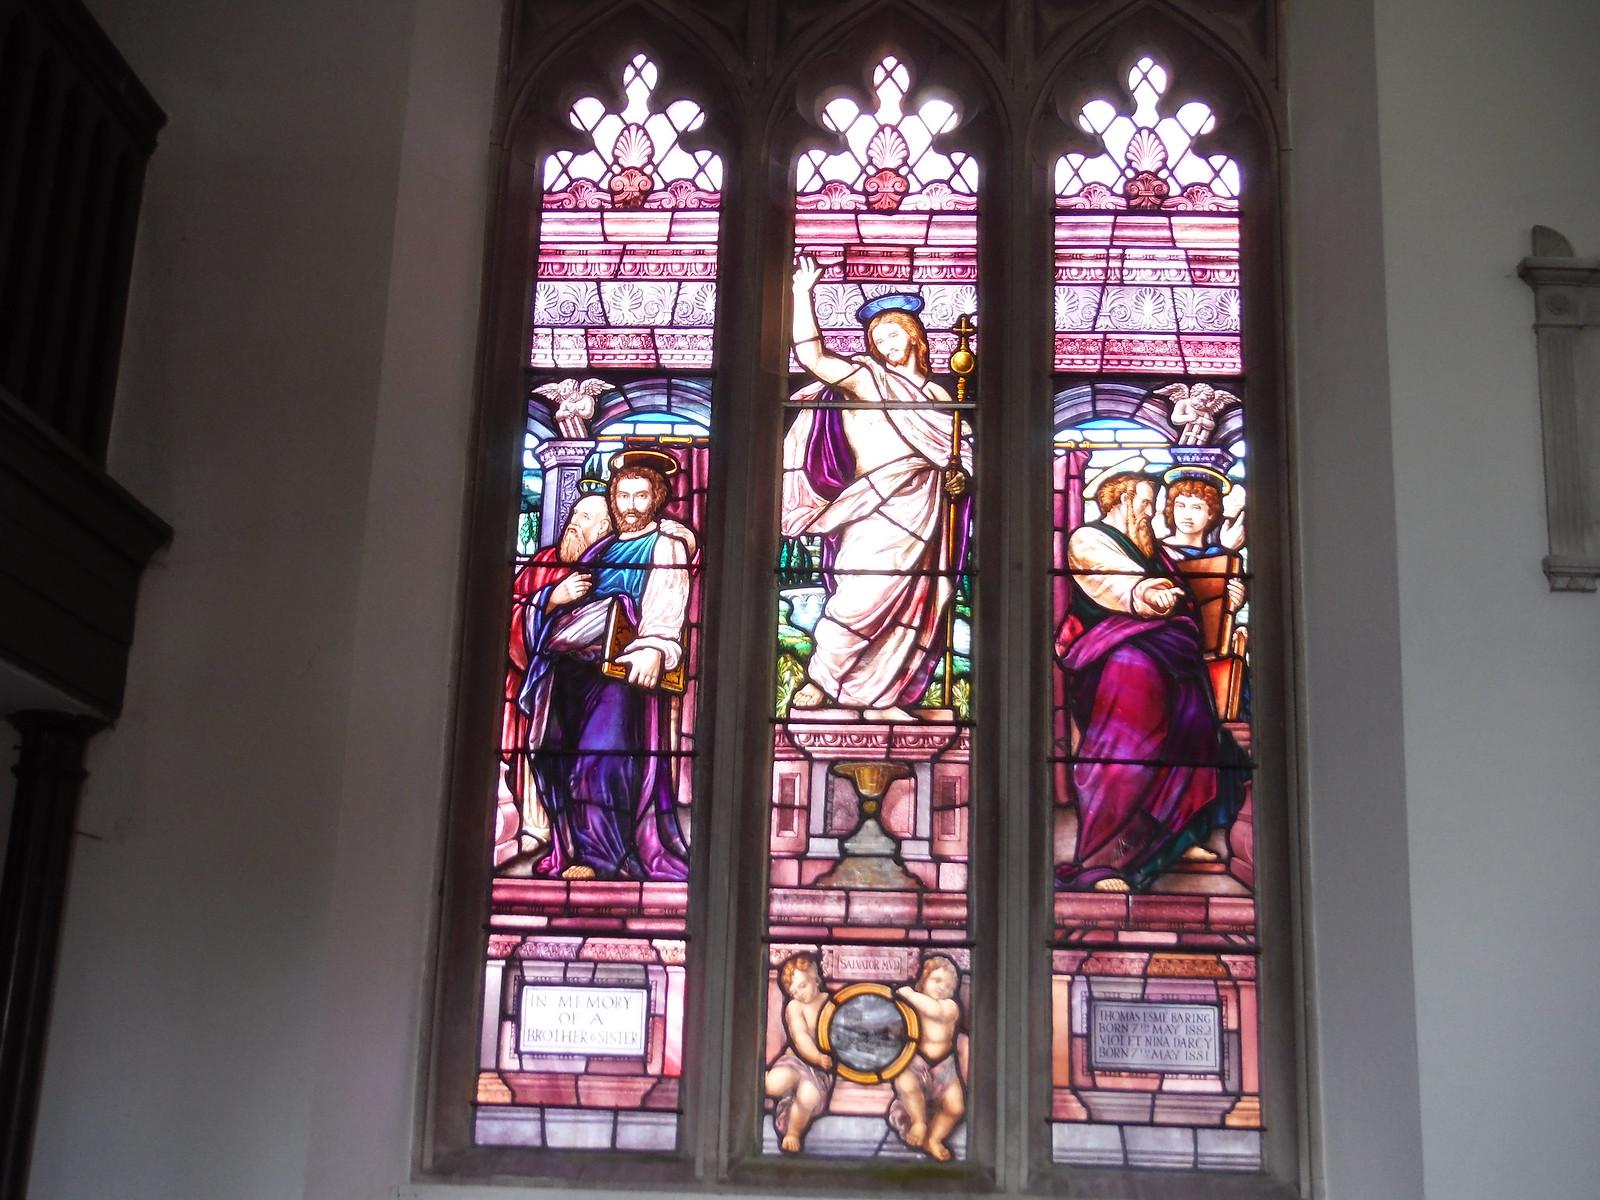 Stained Glass Window, St. Peter, West Tytherley SWC Walk 265 - Dean to Mottisfont & Dunbridge